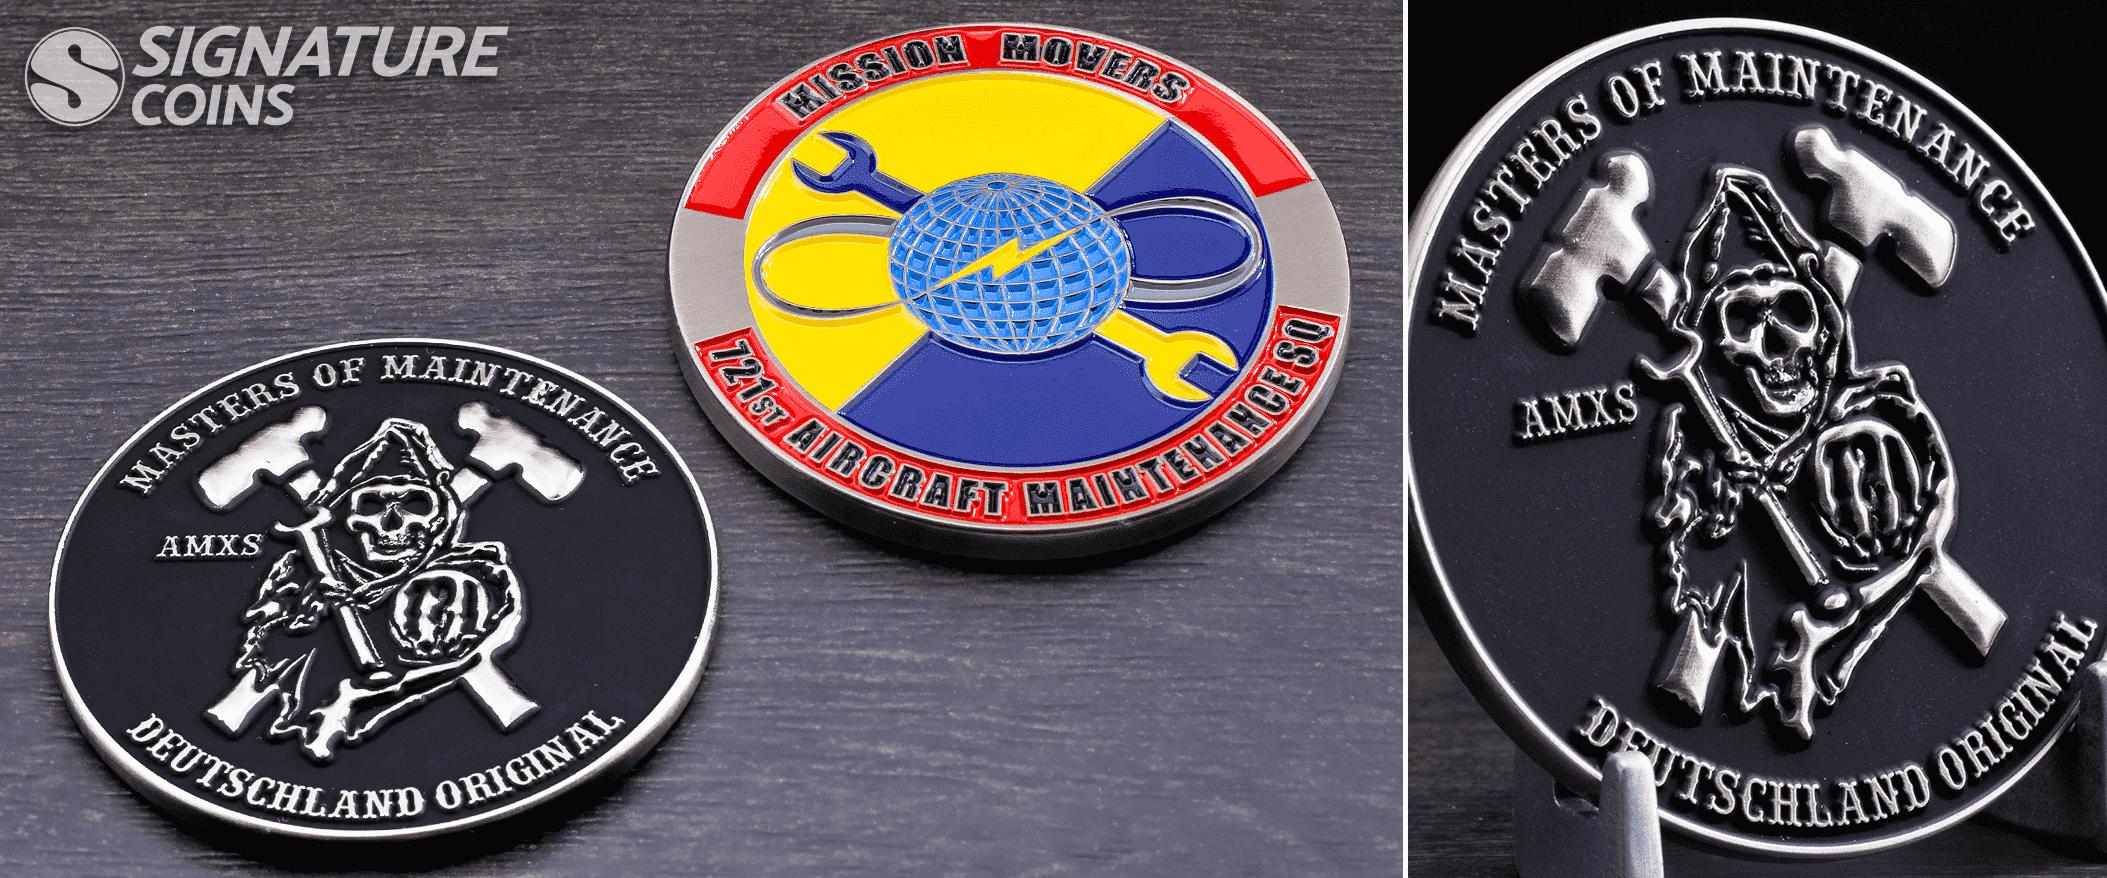 Masters of Maintenance Black Enamel challenge coin